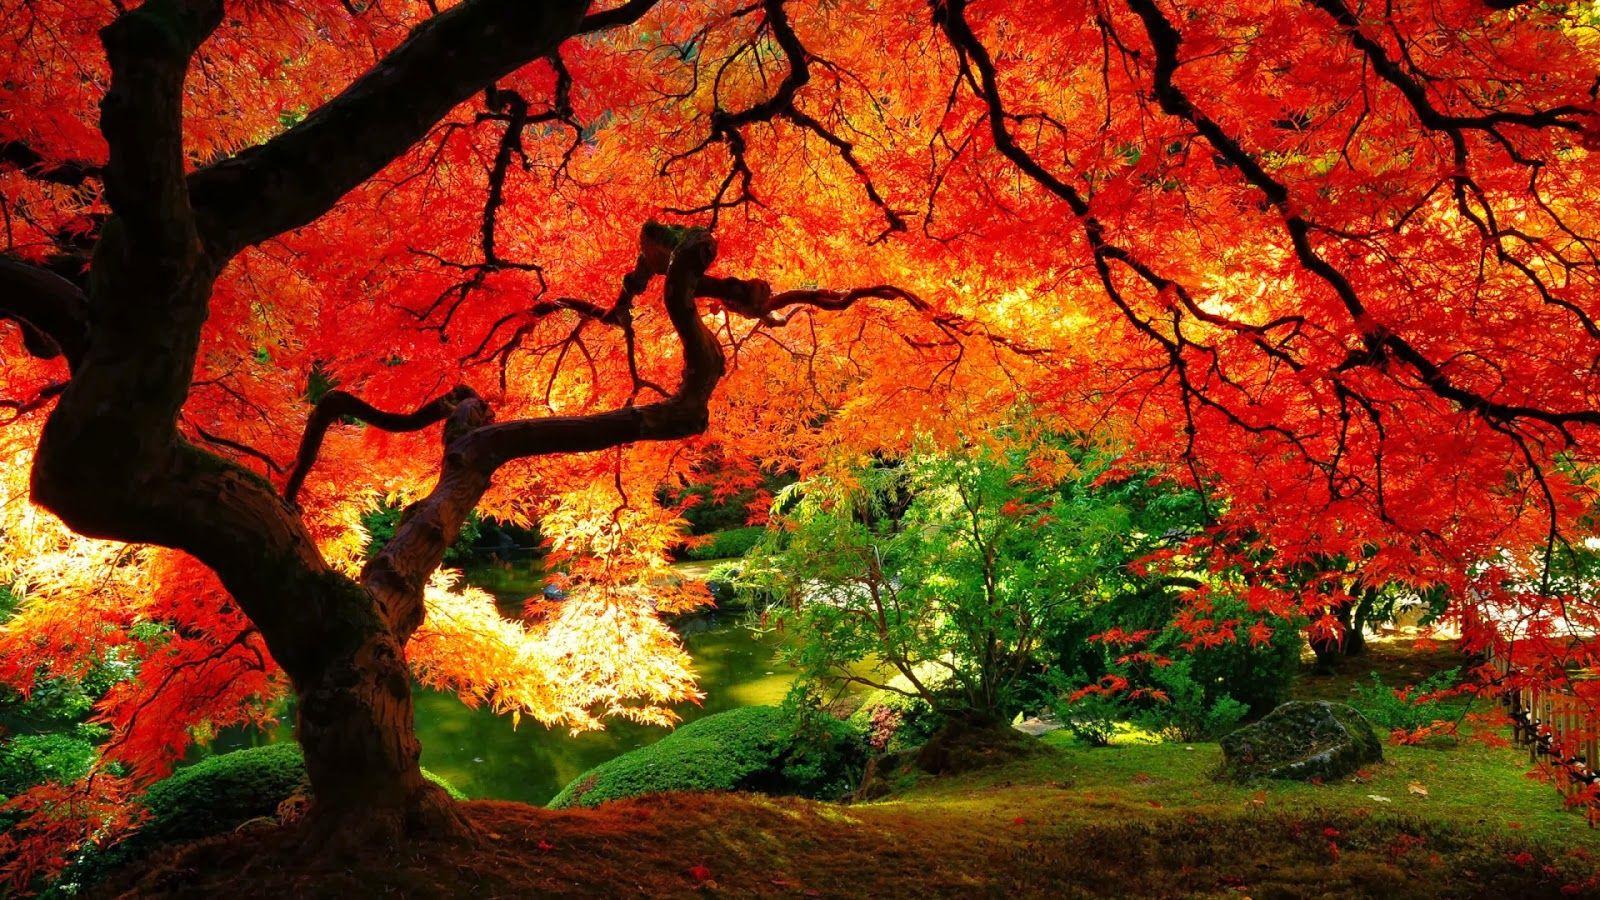 Desktop Backgrounds Wallpapers Autumn Scenery Nature Desktop Beautiful Nature